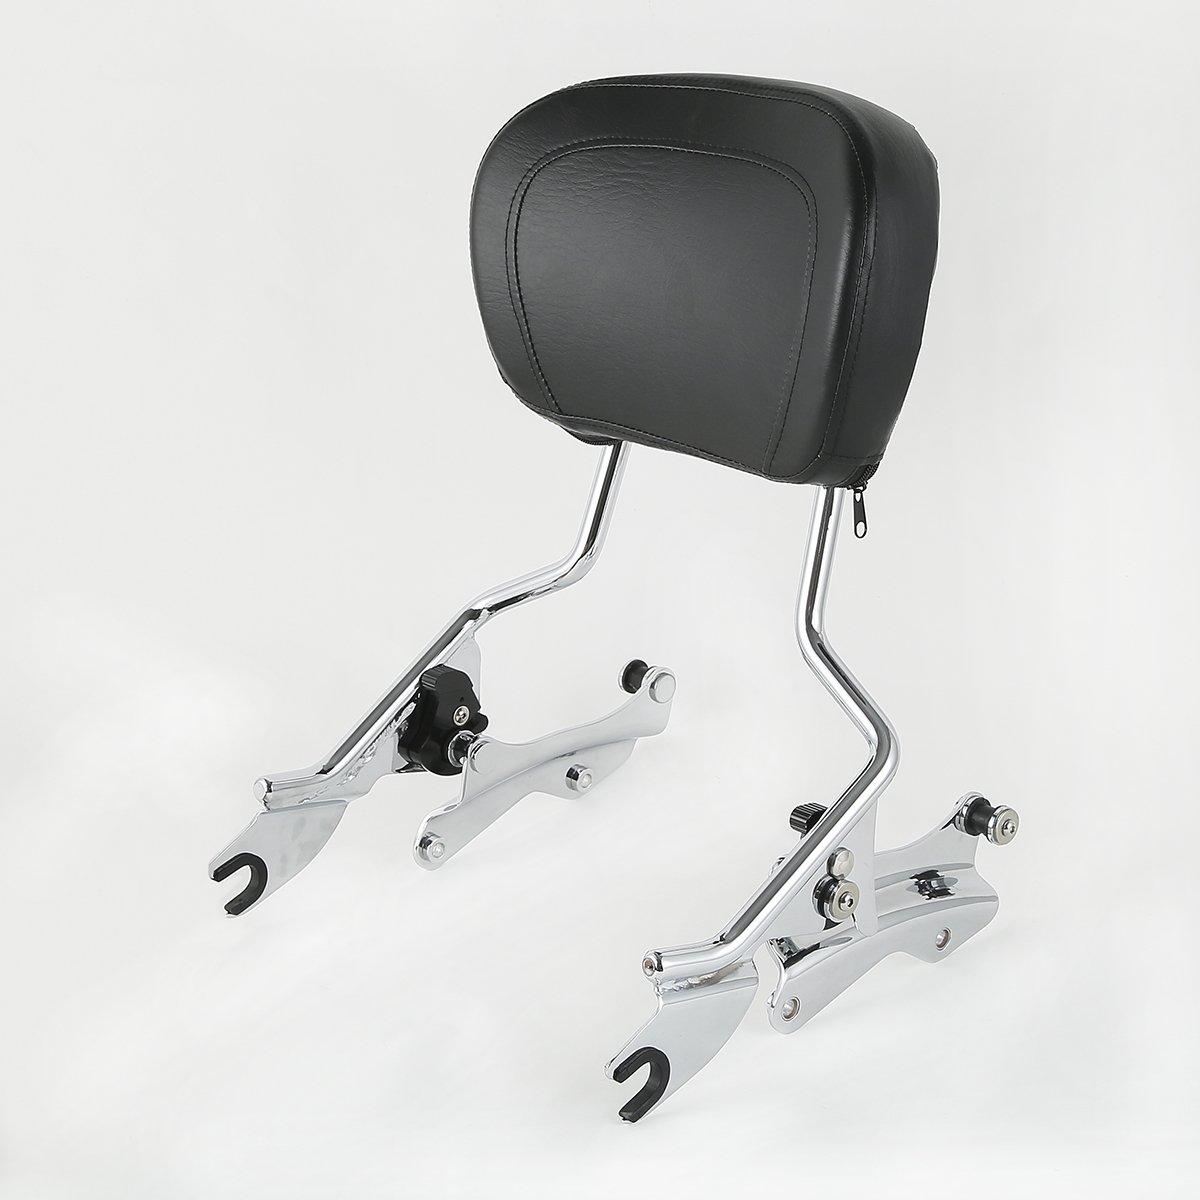 +4-Point Docking Hardware Kit Chrome H-D Detachables Sissy Bar Upright w//Black Pad Part Number 52627-09A Fits fits for Harley-Davidson Touring Models 2014-2019 Part Number 52300353